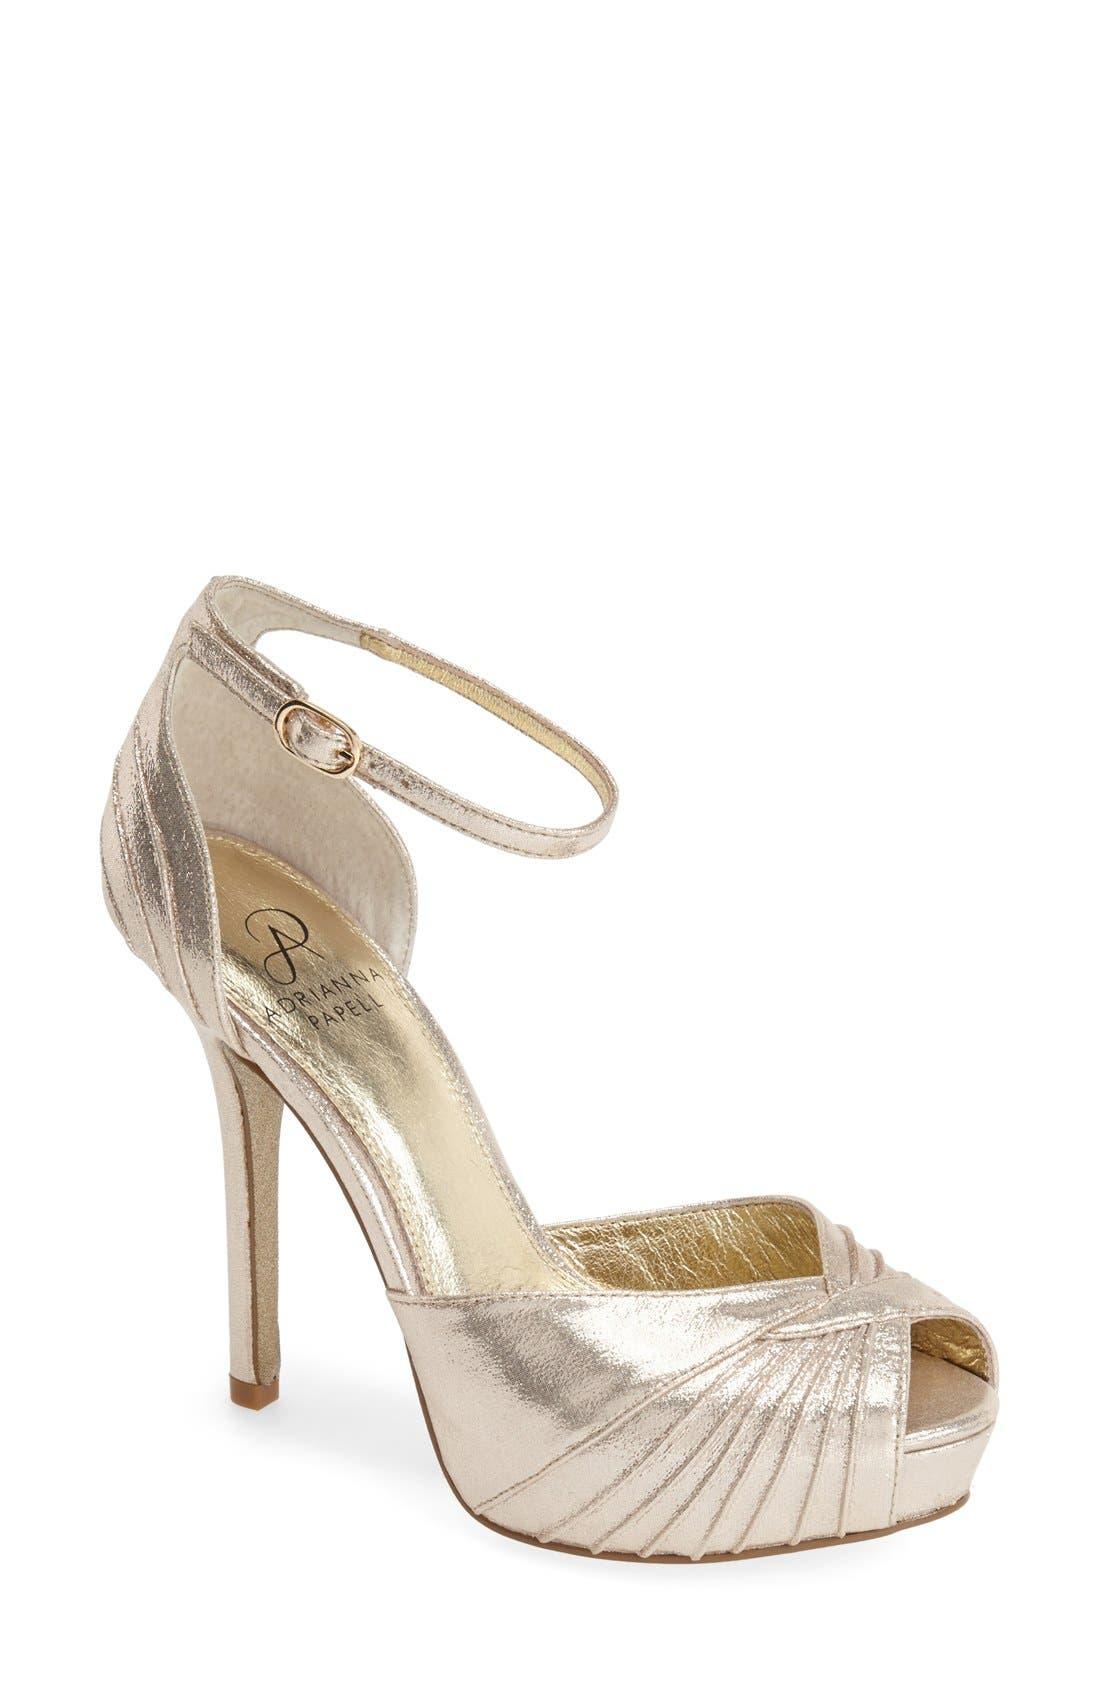 Main Image - Adrianna Papell 'Rebecca' Platform Sandal (Women)